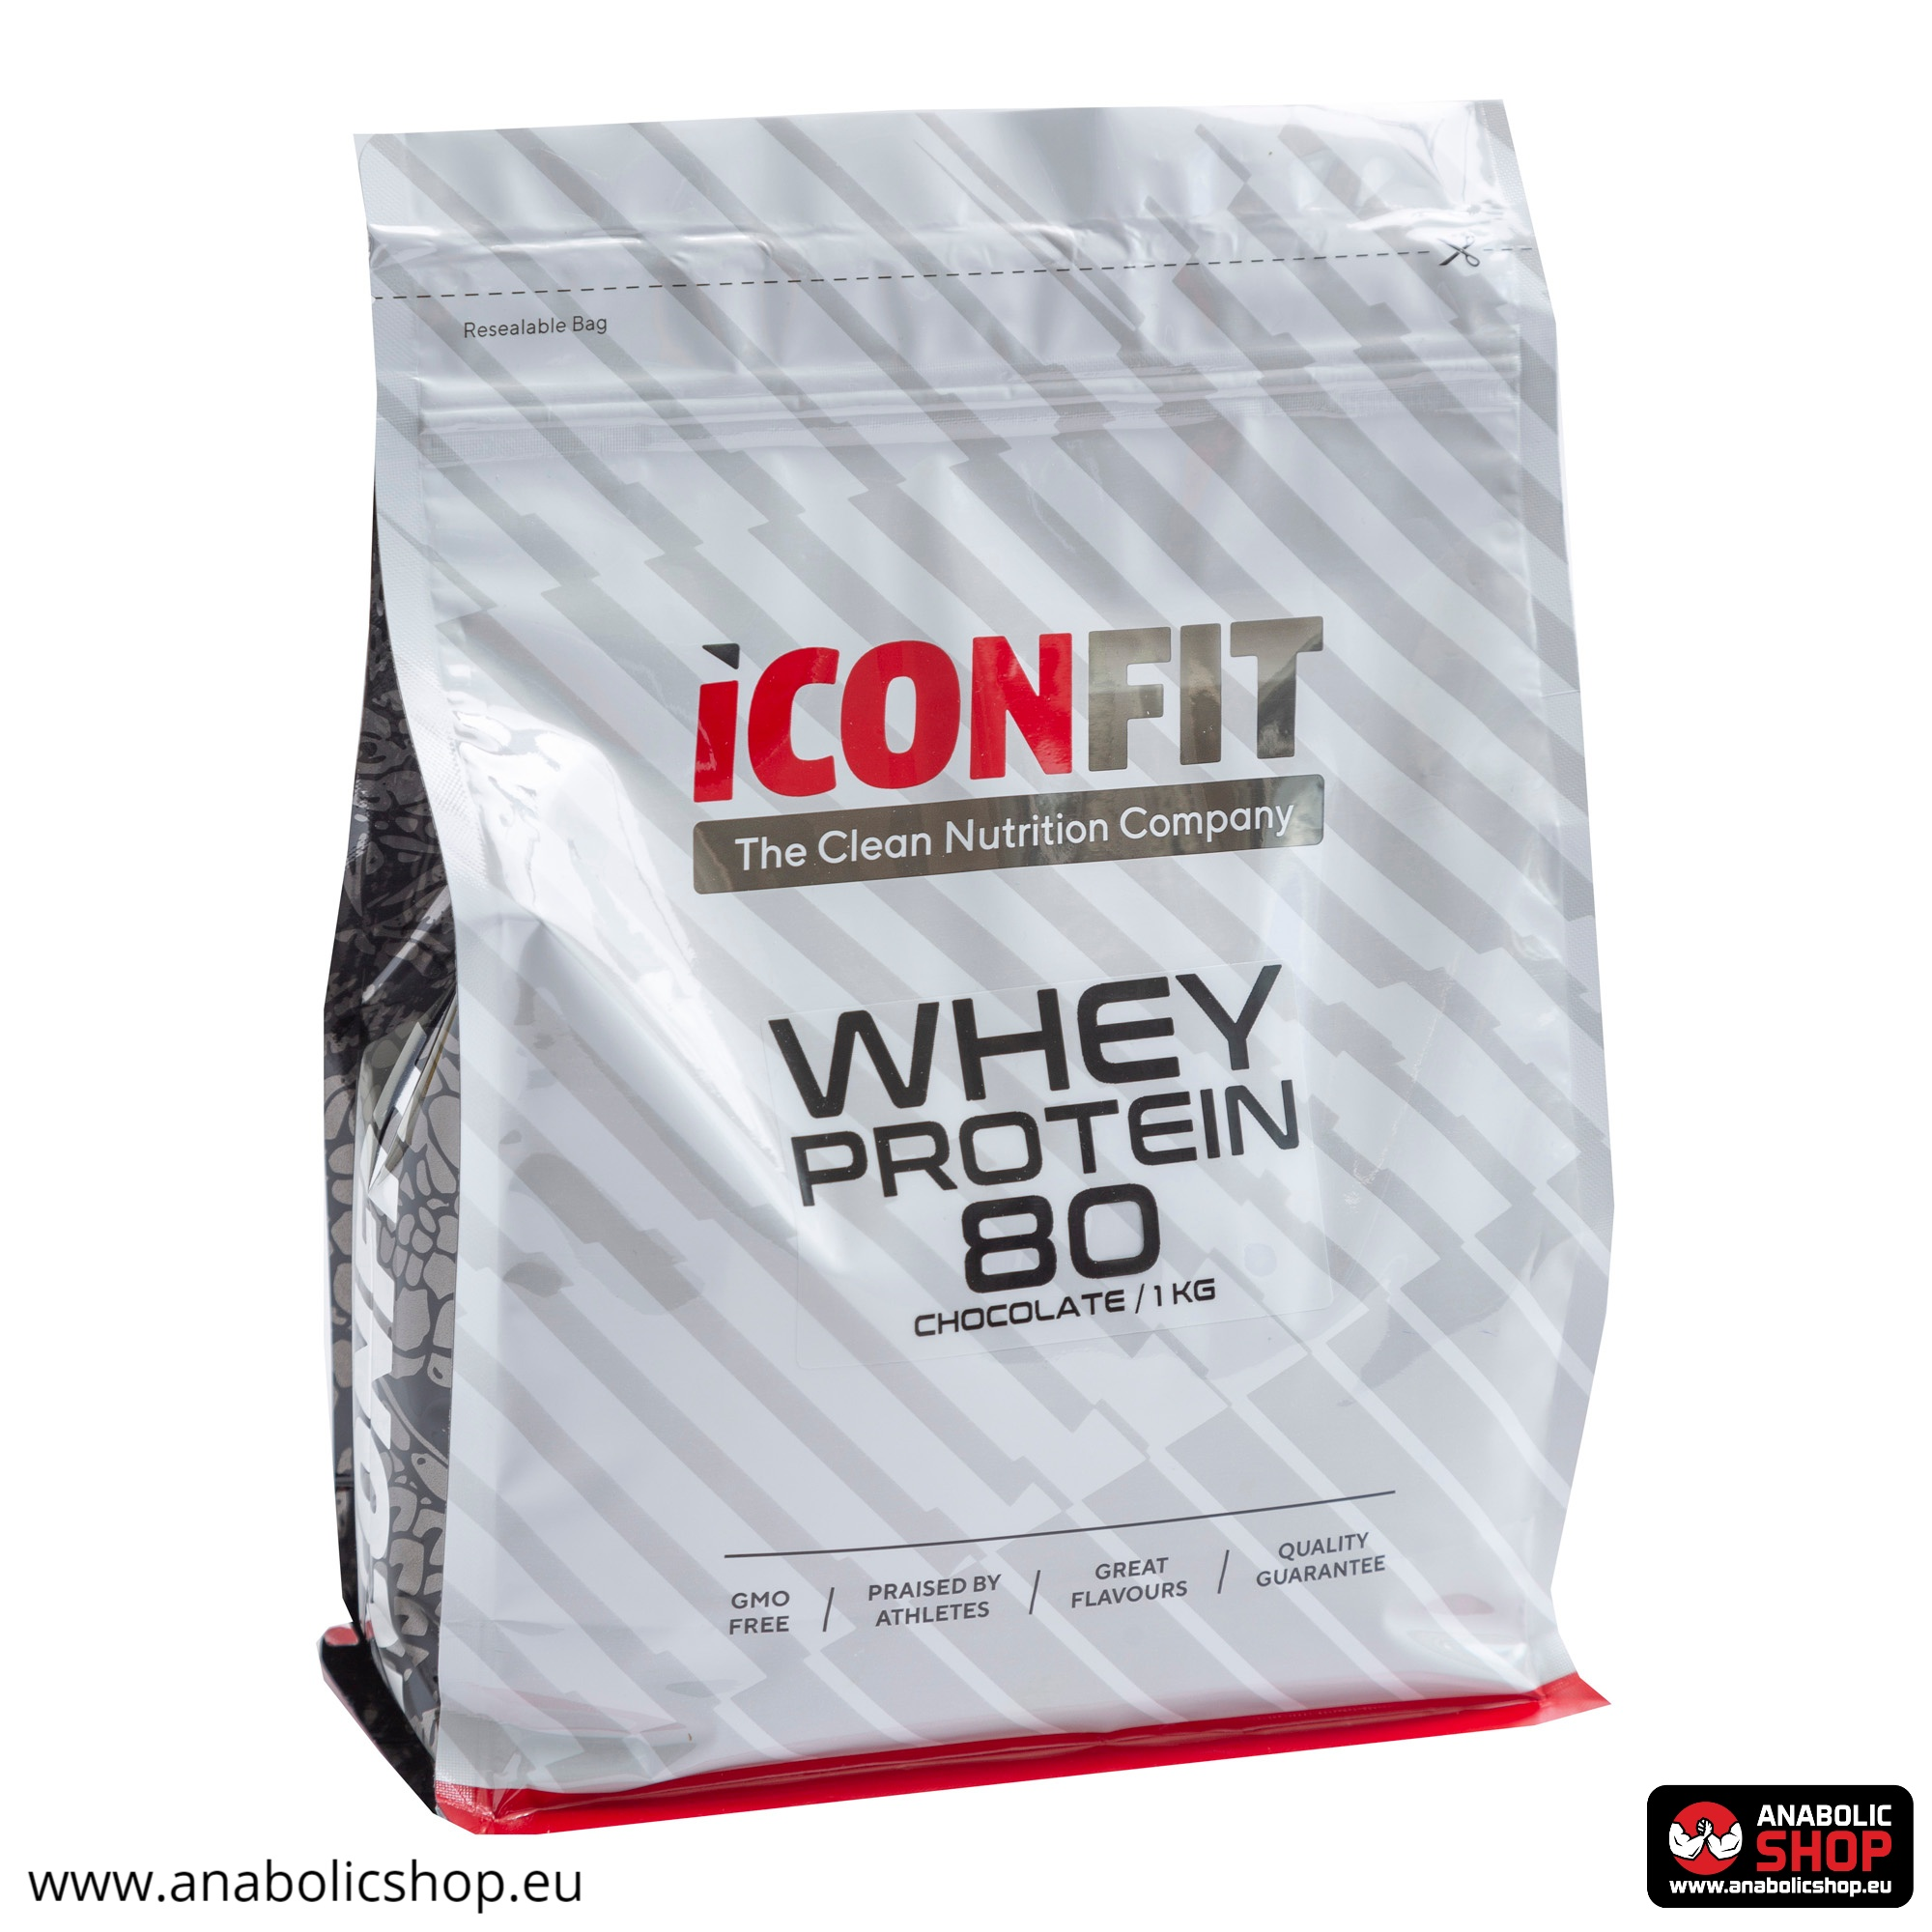 Iconfit Whey Protein 80